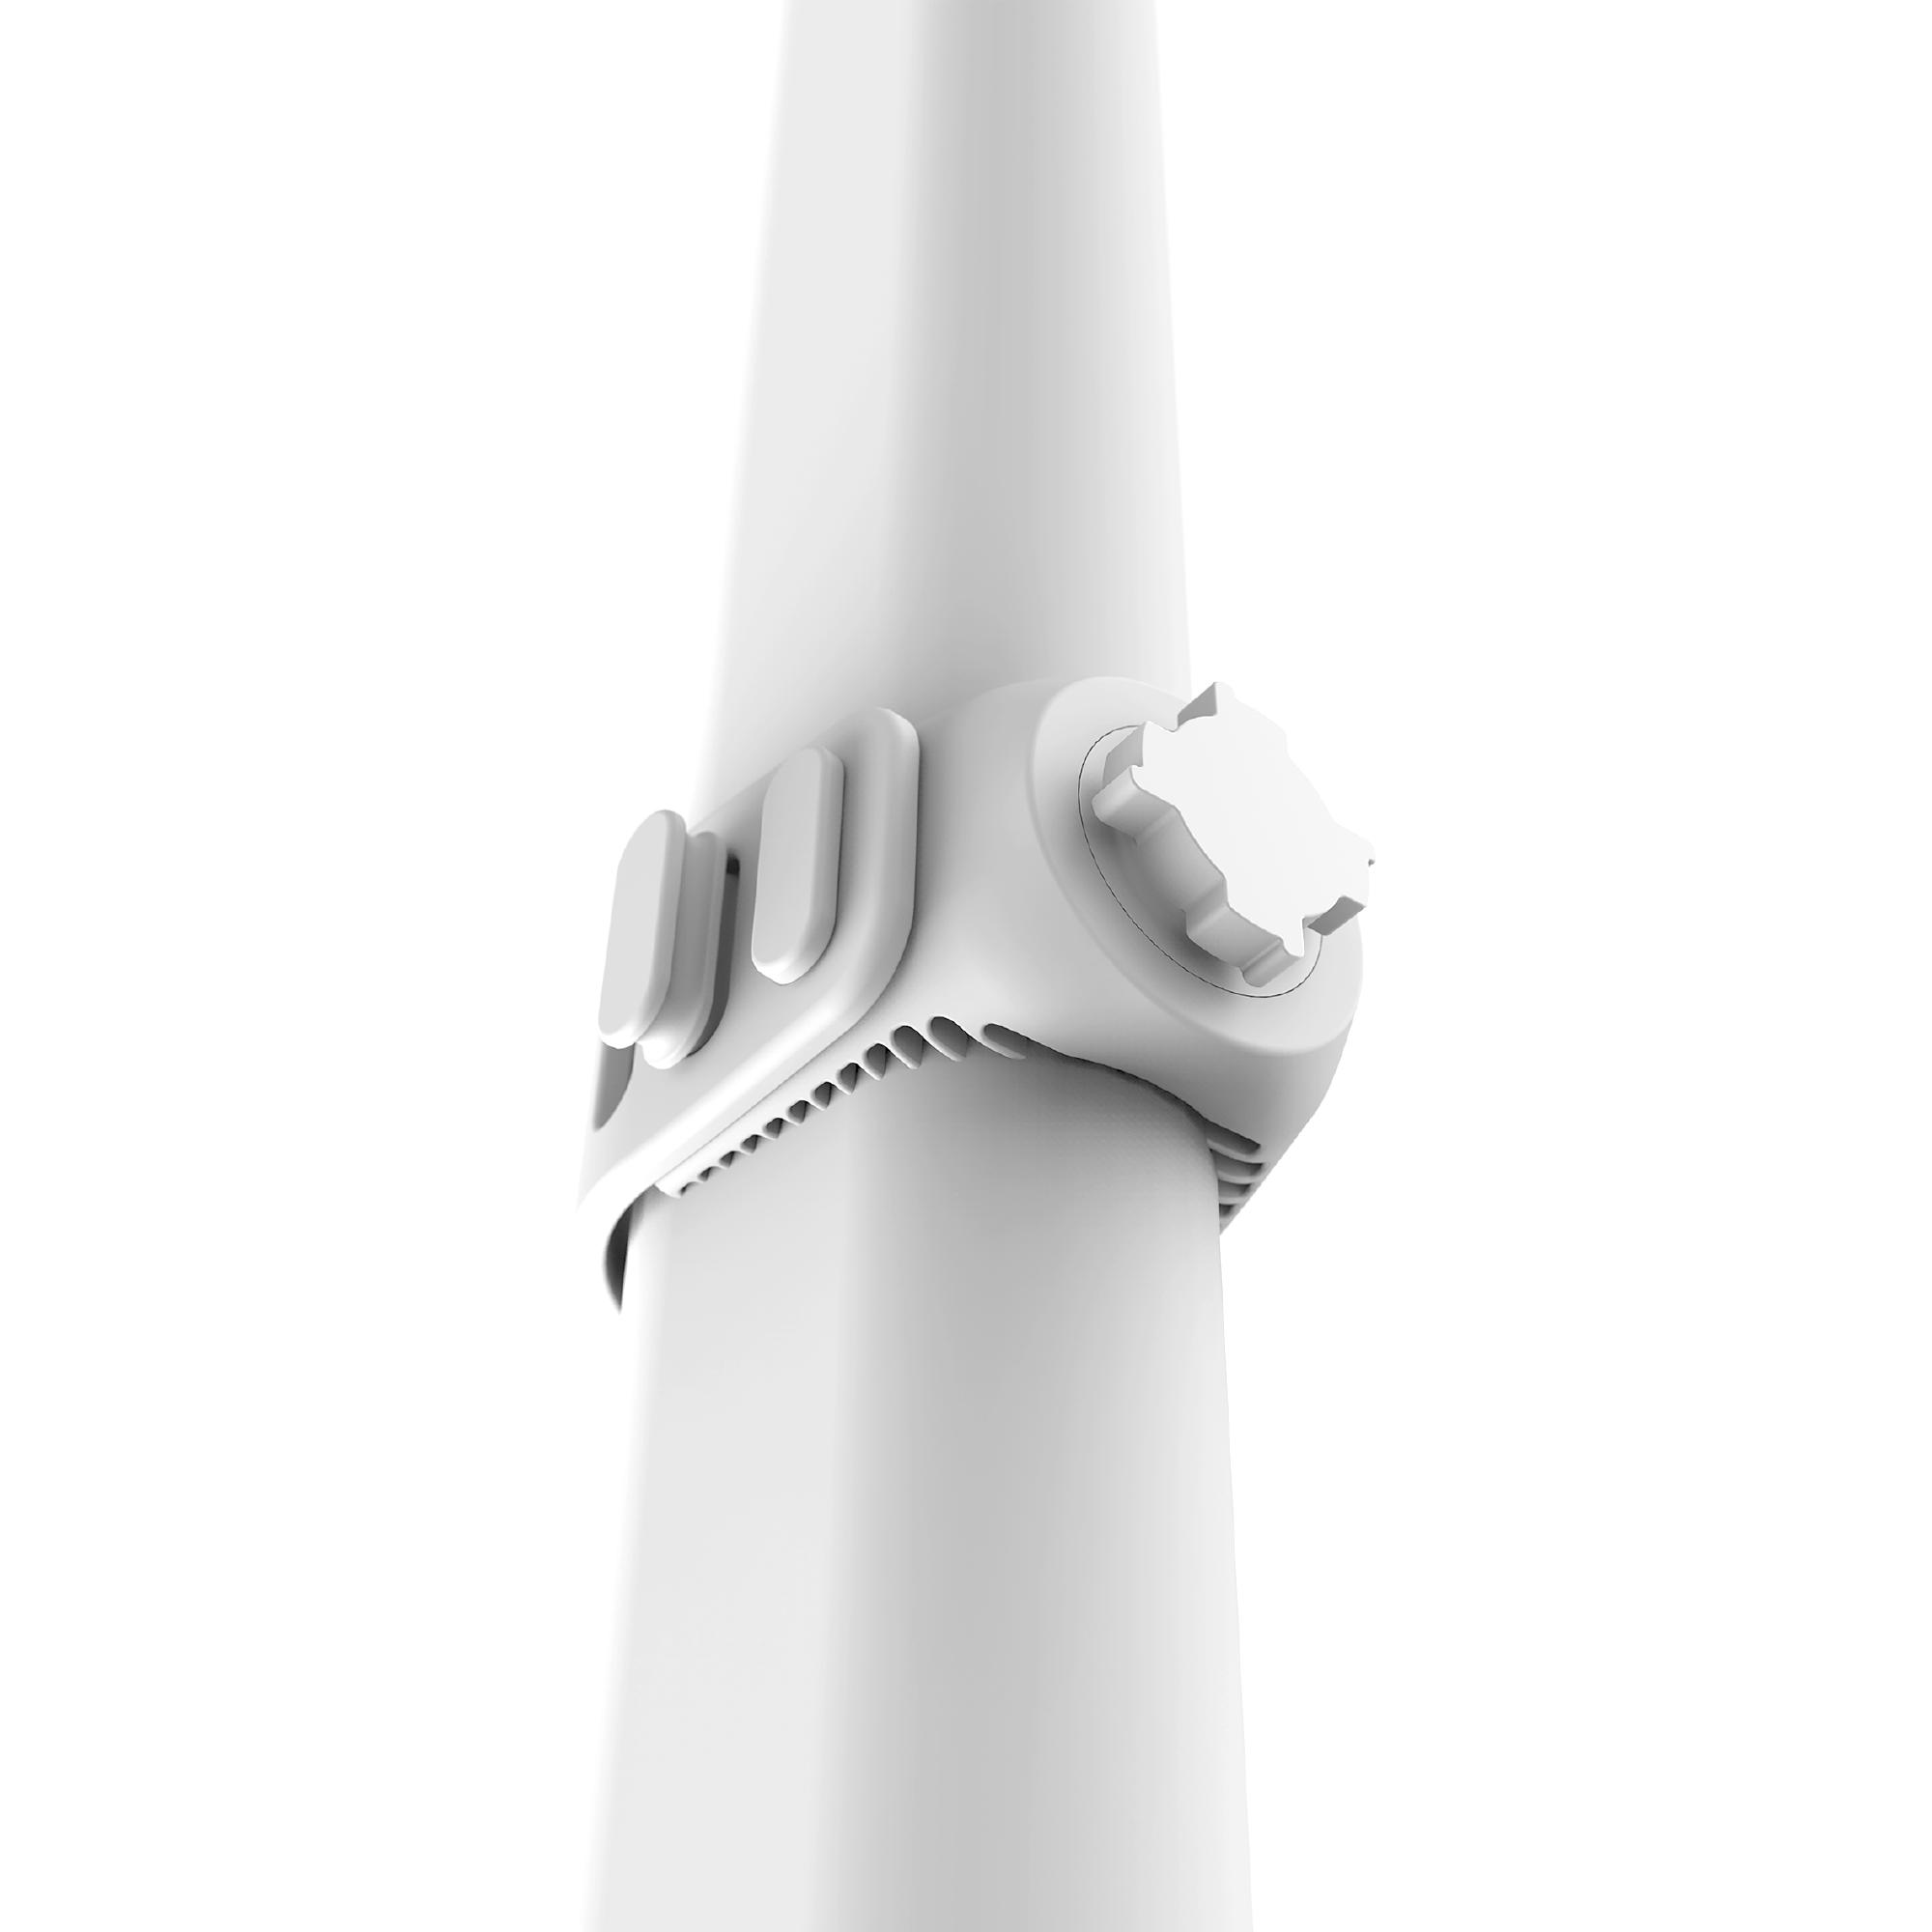 Dental-pole-mount-for-tissue-box